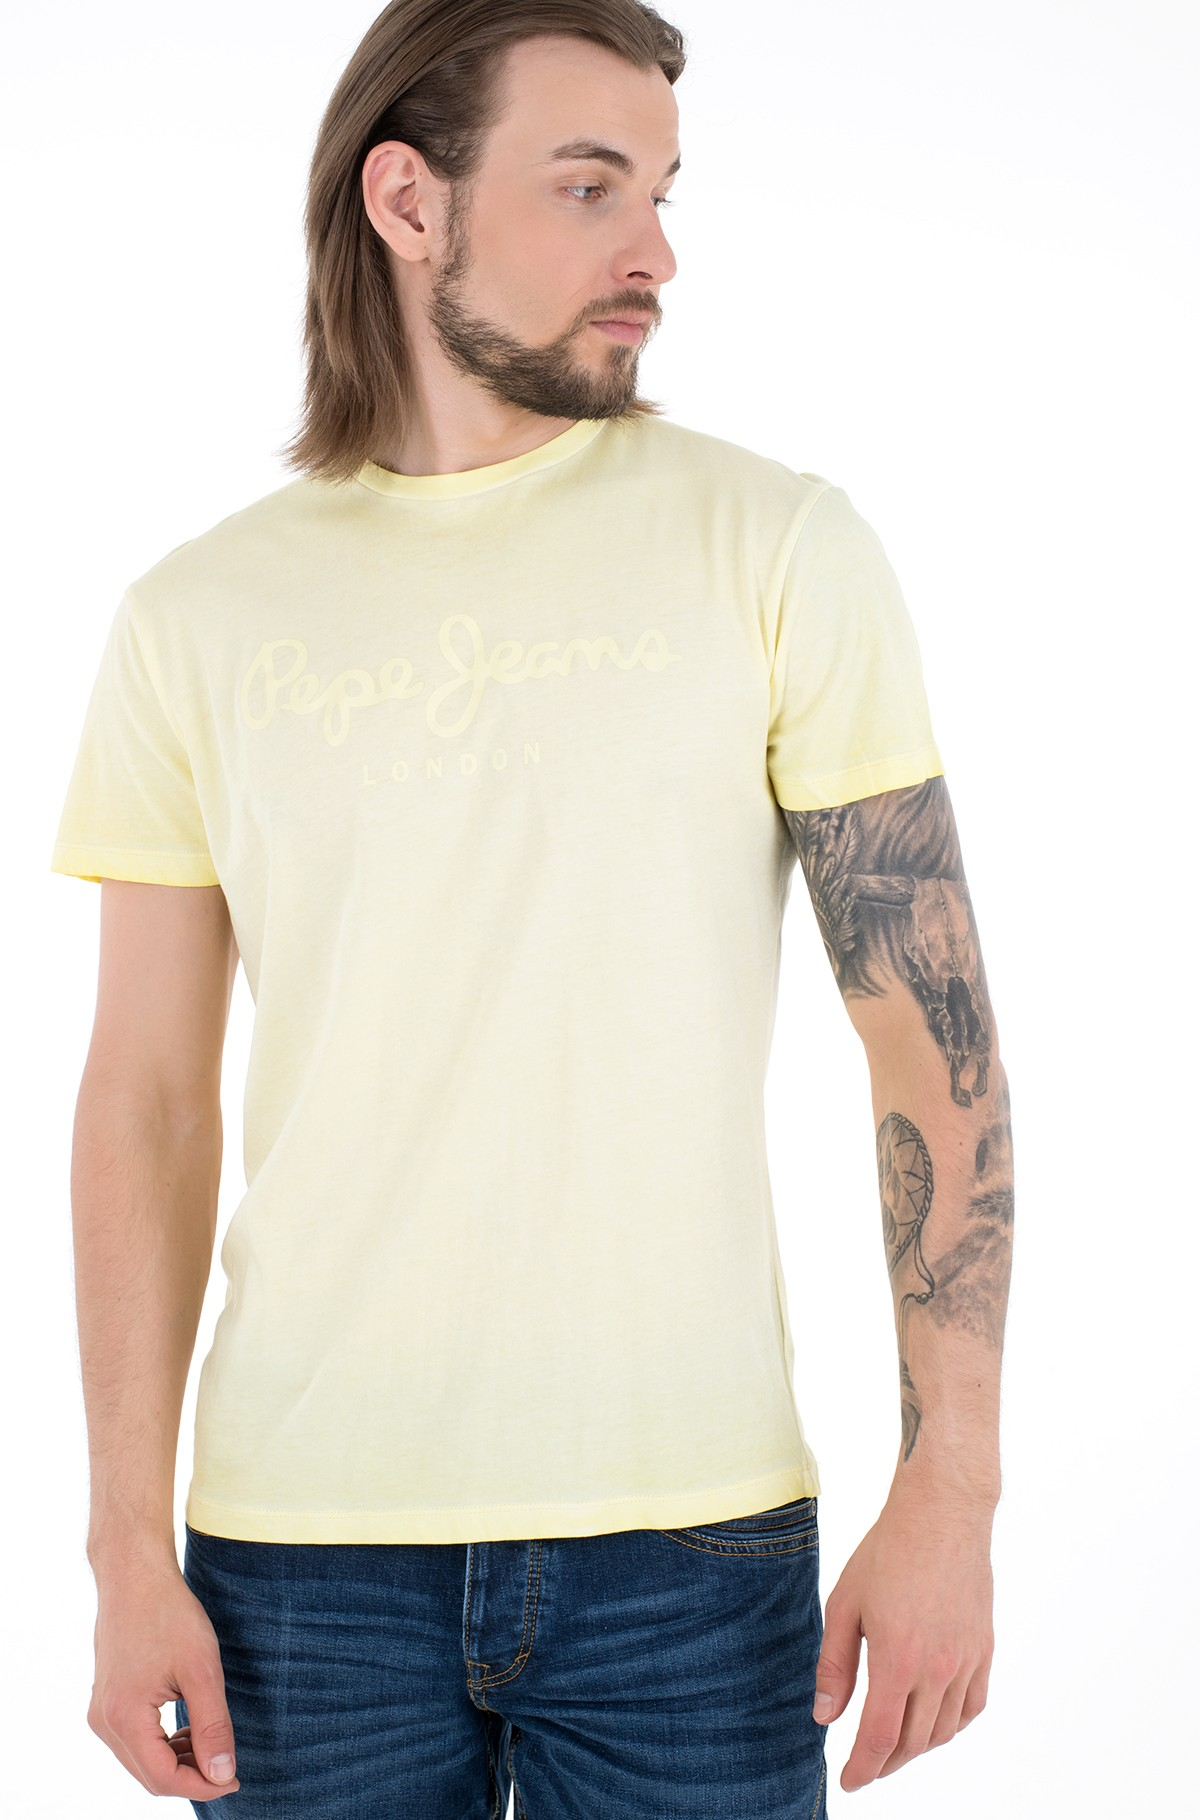 T-shirt WEST SIR/PM504032-full-1